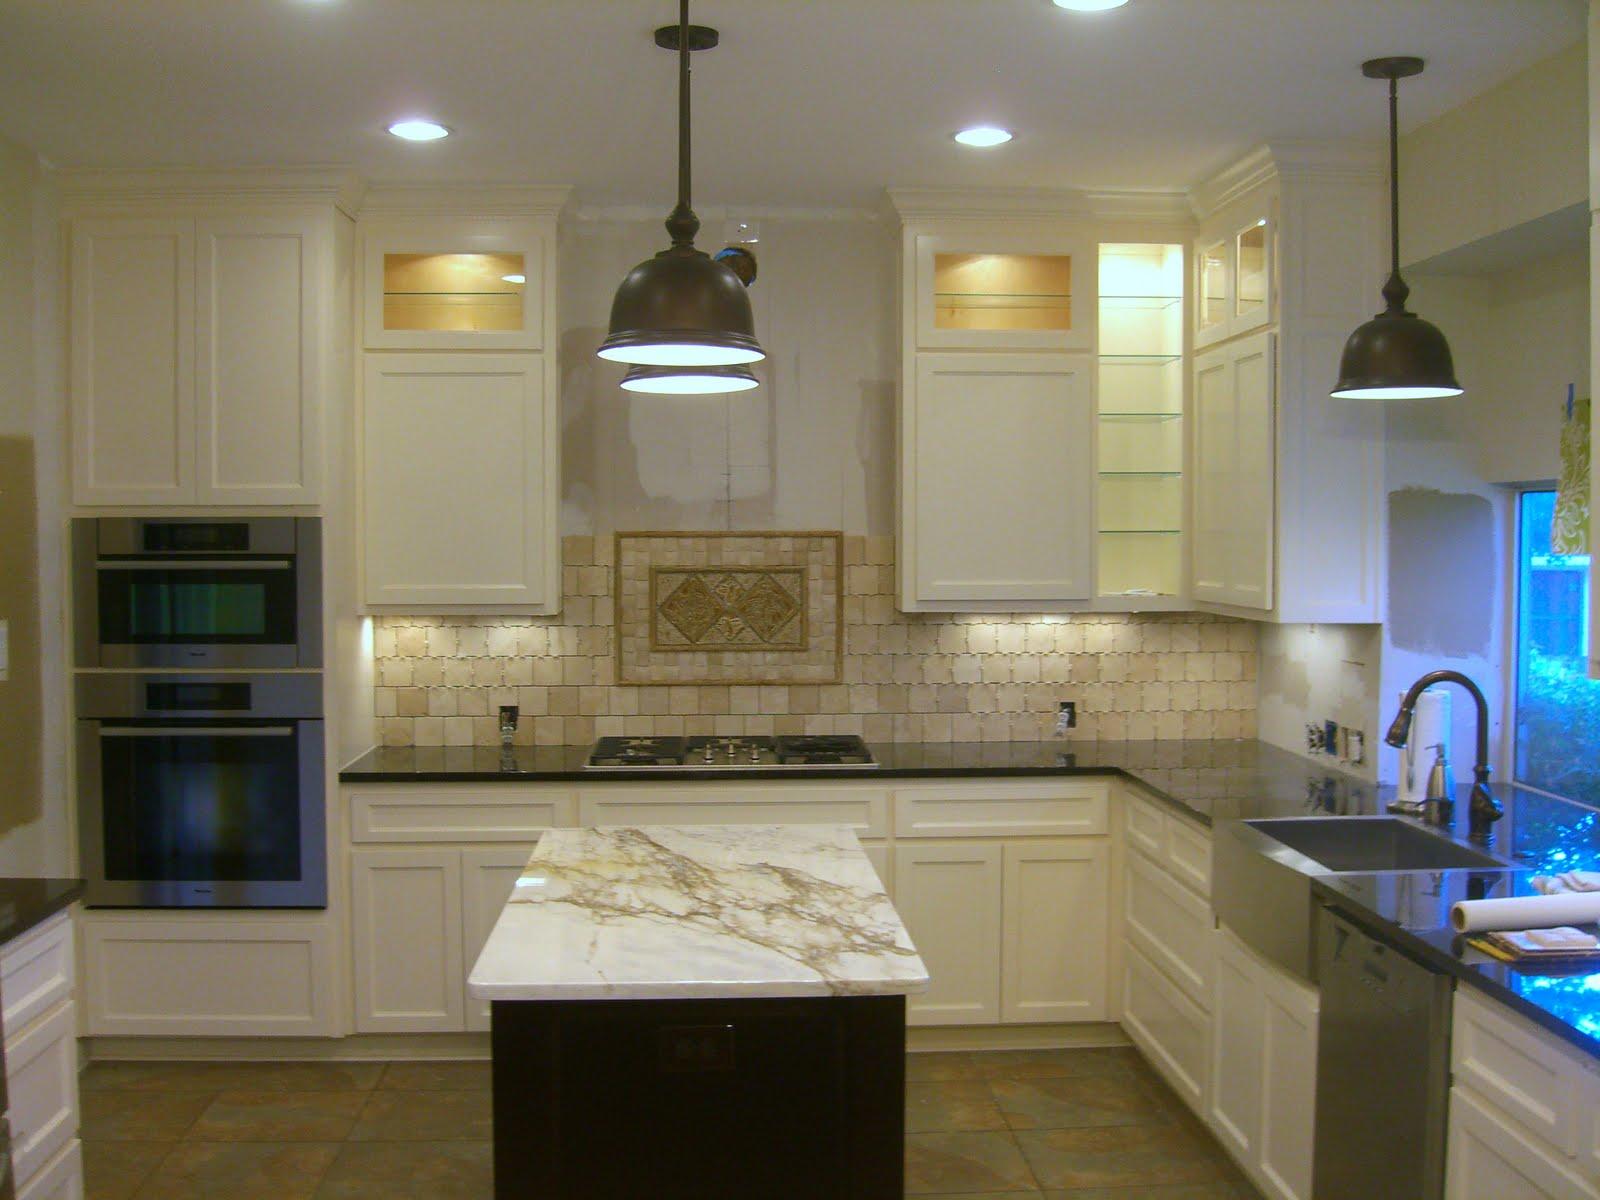 design kitchen kitchen tiles kitchen kitchen wall tiles texture kitchens